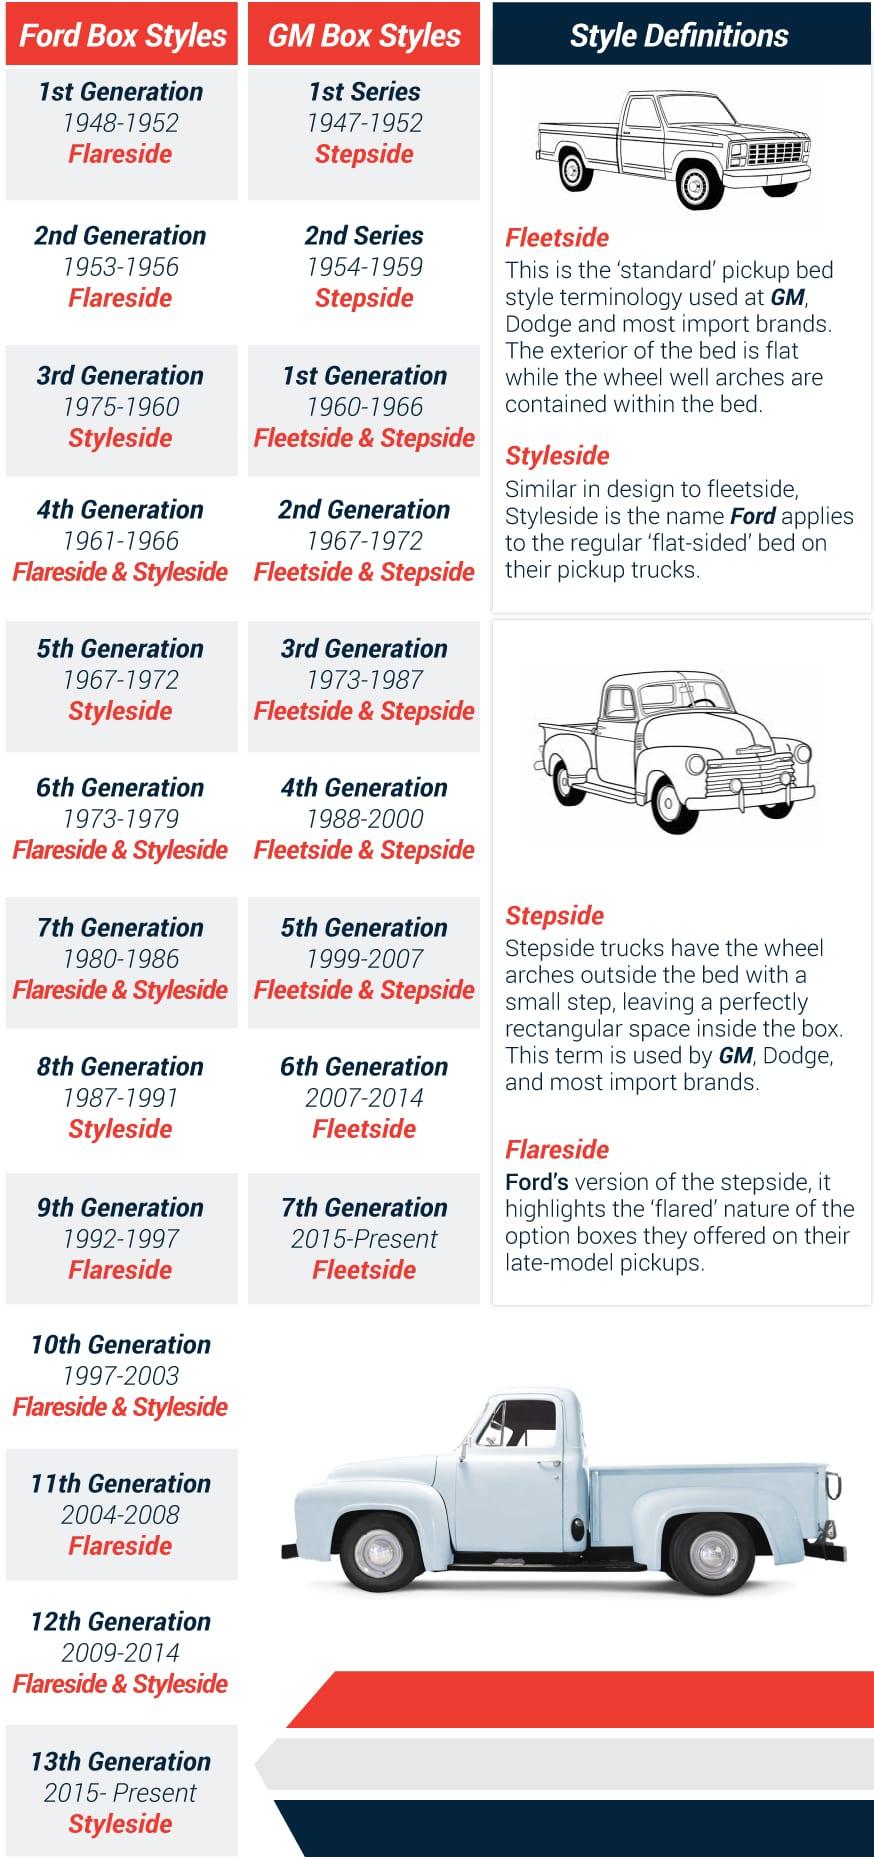 64 Chevy C10 Wiring Diagram 65 Truck Stepside Vs Fleetside Truck Bed Pickup Truck Bed Style